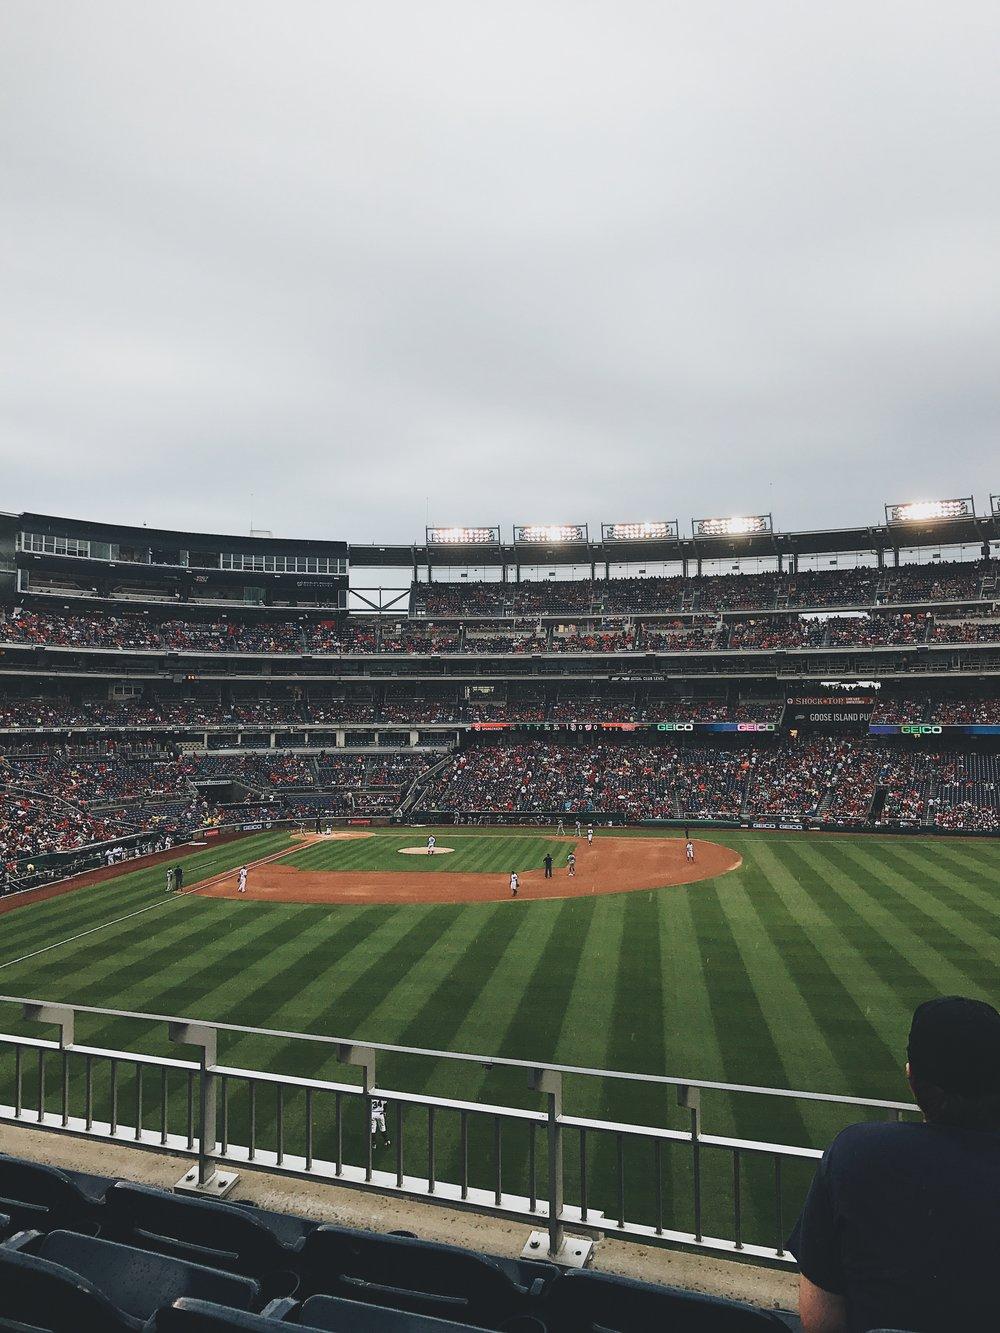 Nationals Baseball Game | Photo Credit: Chad Jimenez